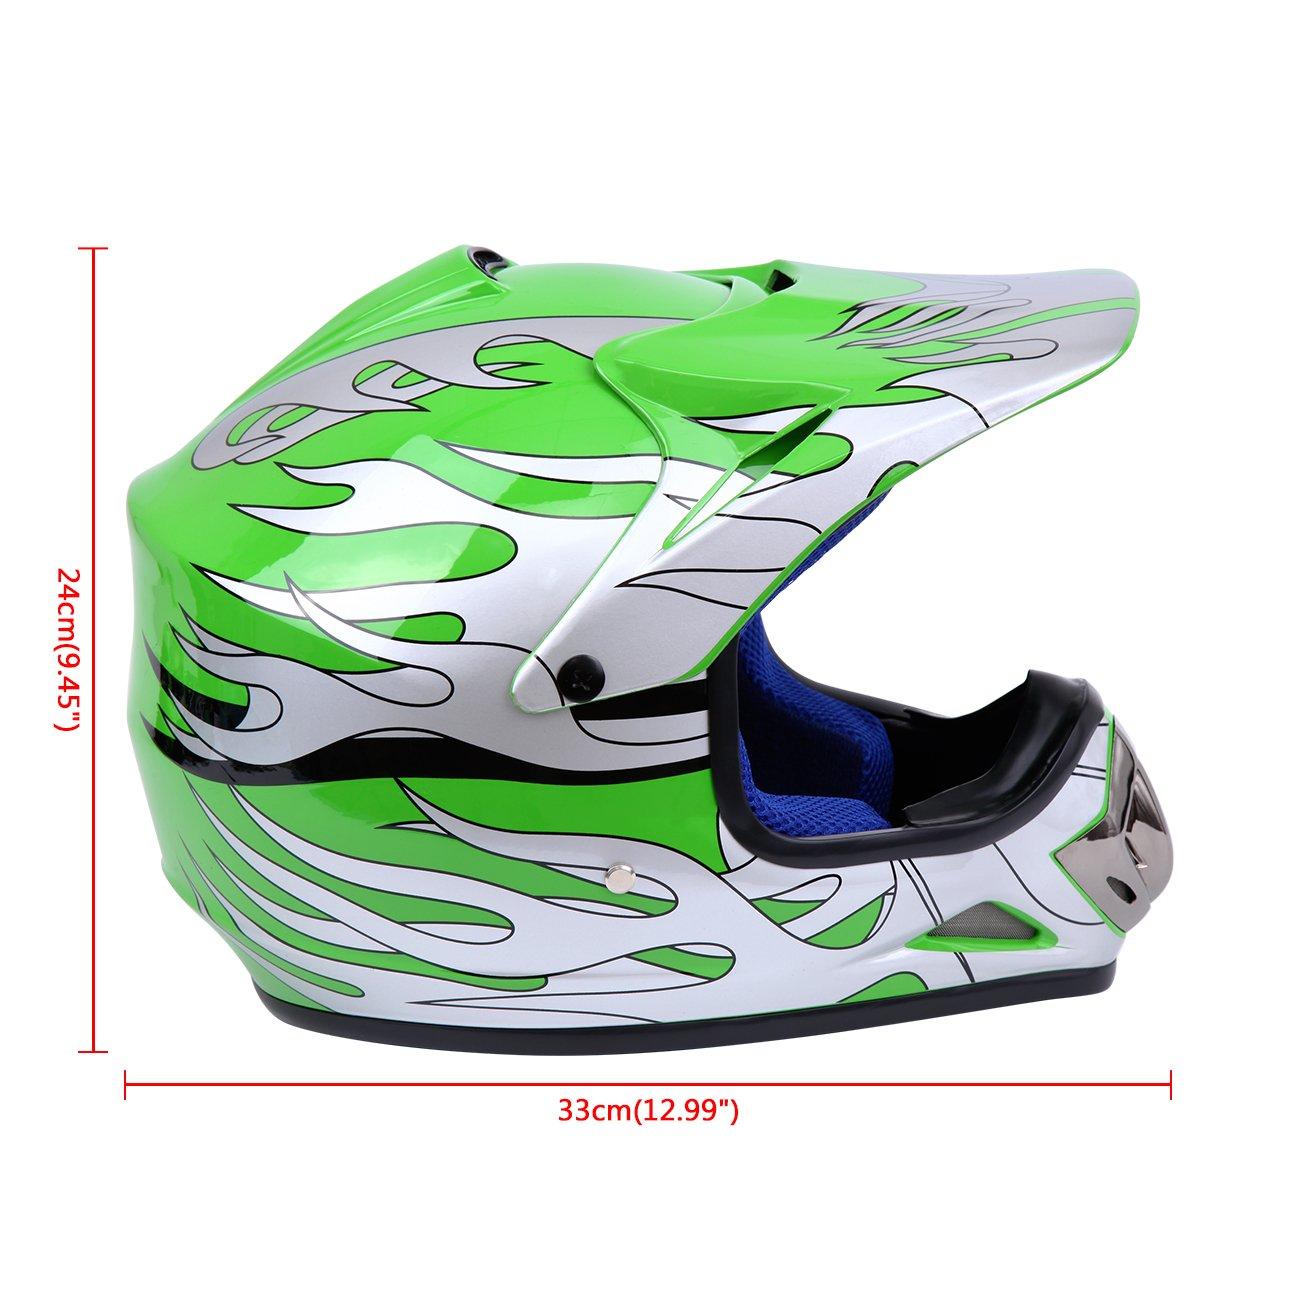 Samger Dot Enfant Casque Hors-Route Casque Motocross Dirt Bike Casque de Moto VTT avec Gants+Lunettes Blanc, L